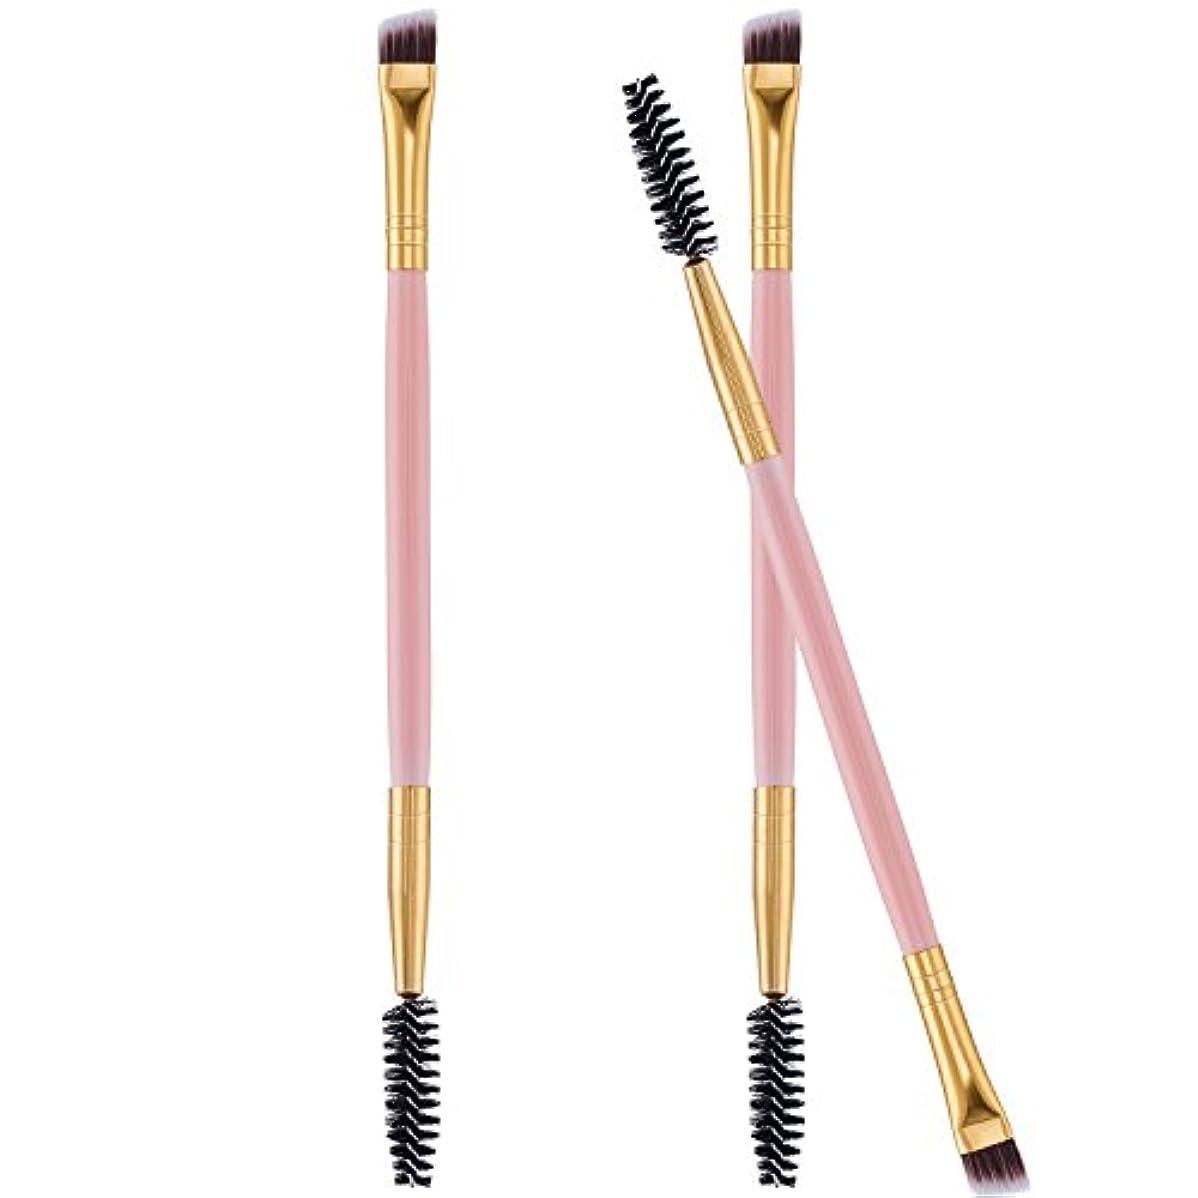 Frienda 3パック目ブローブラシ眉毛スプーリダブルブローパウダーワックスゲルとブレンド 適用 アングルや眉毛コームハンドル ピンク